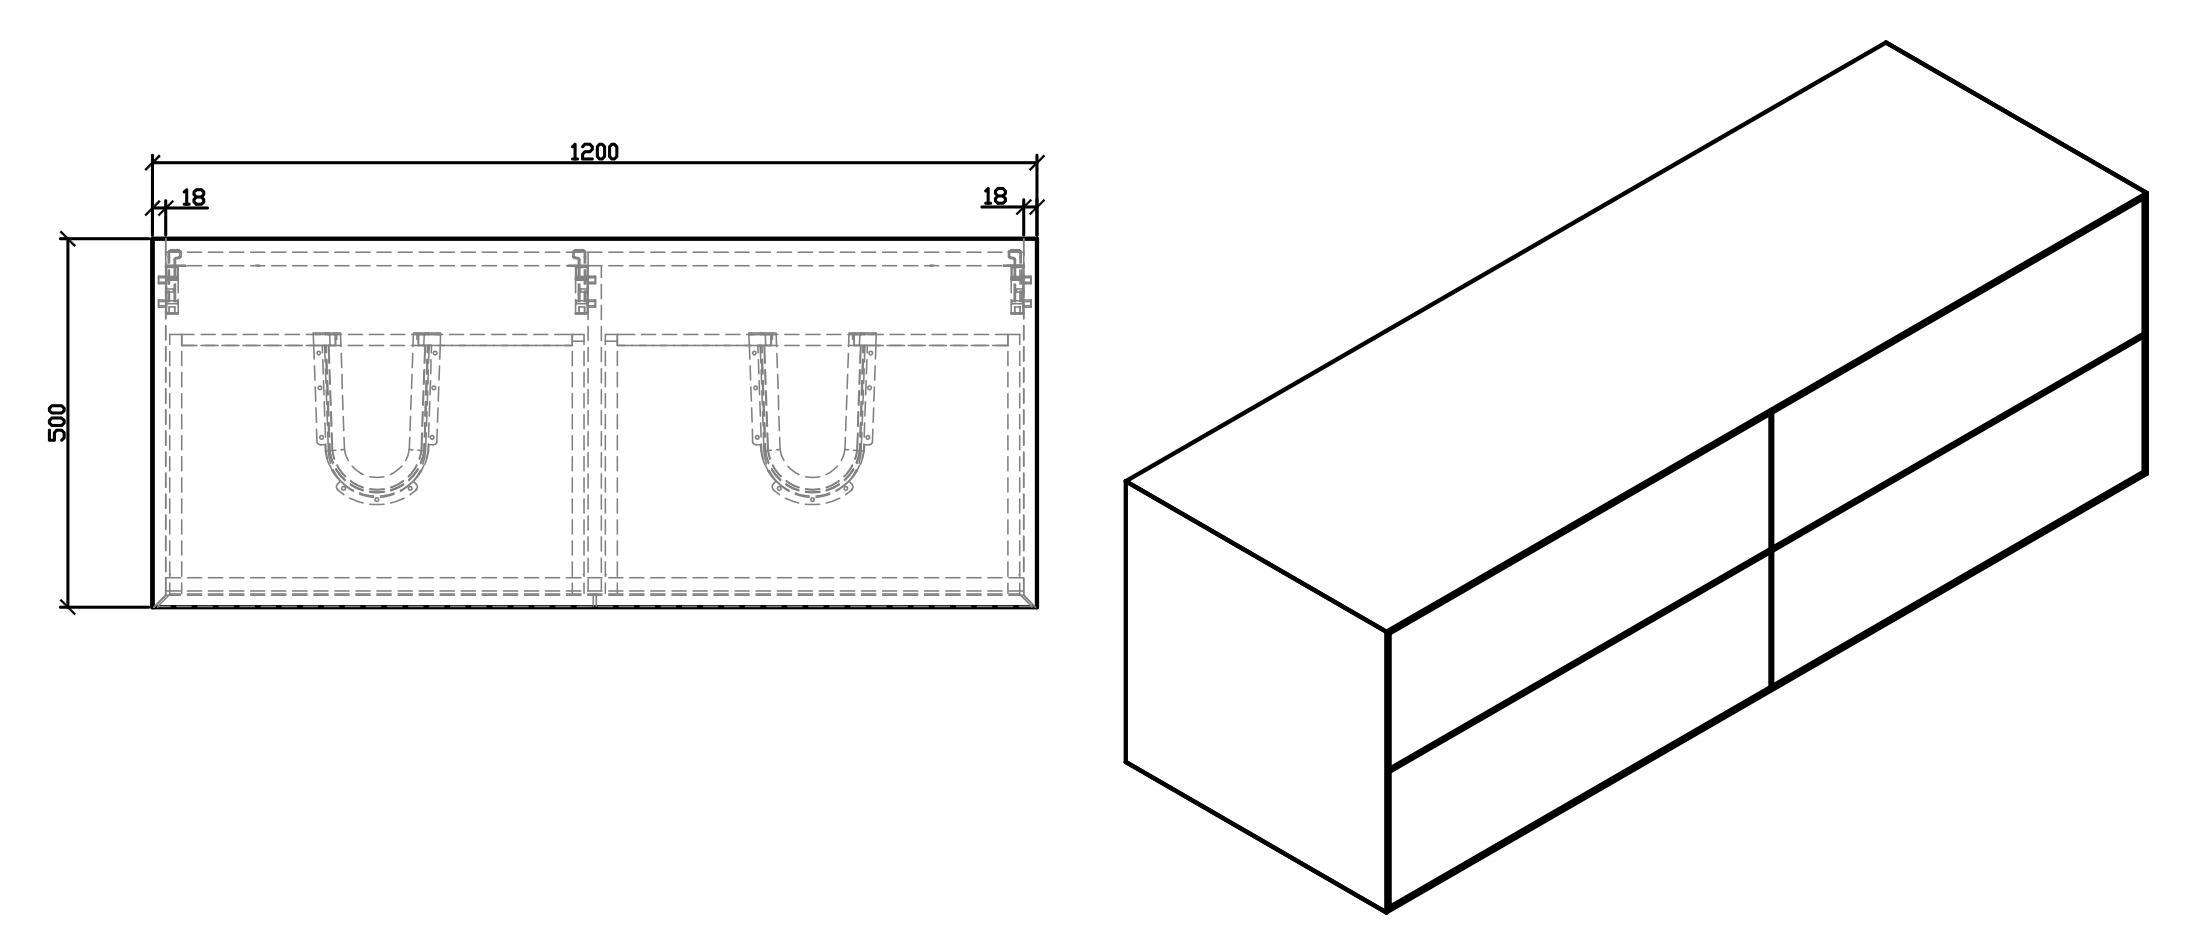 Bathroom furniture set Milou 1200 - Drawing 2